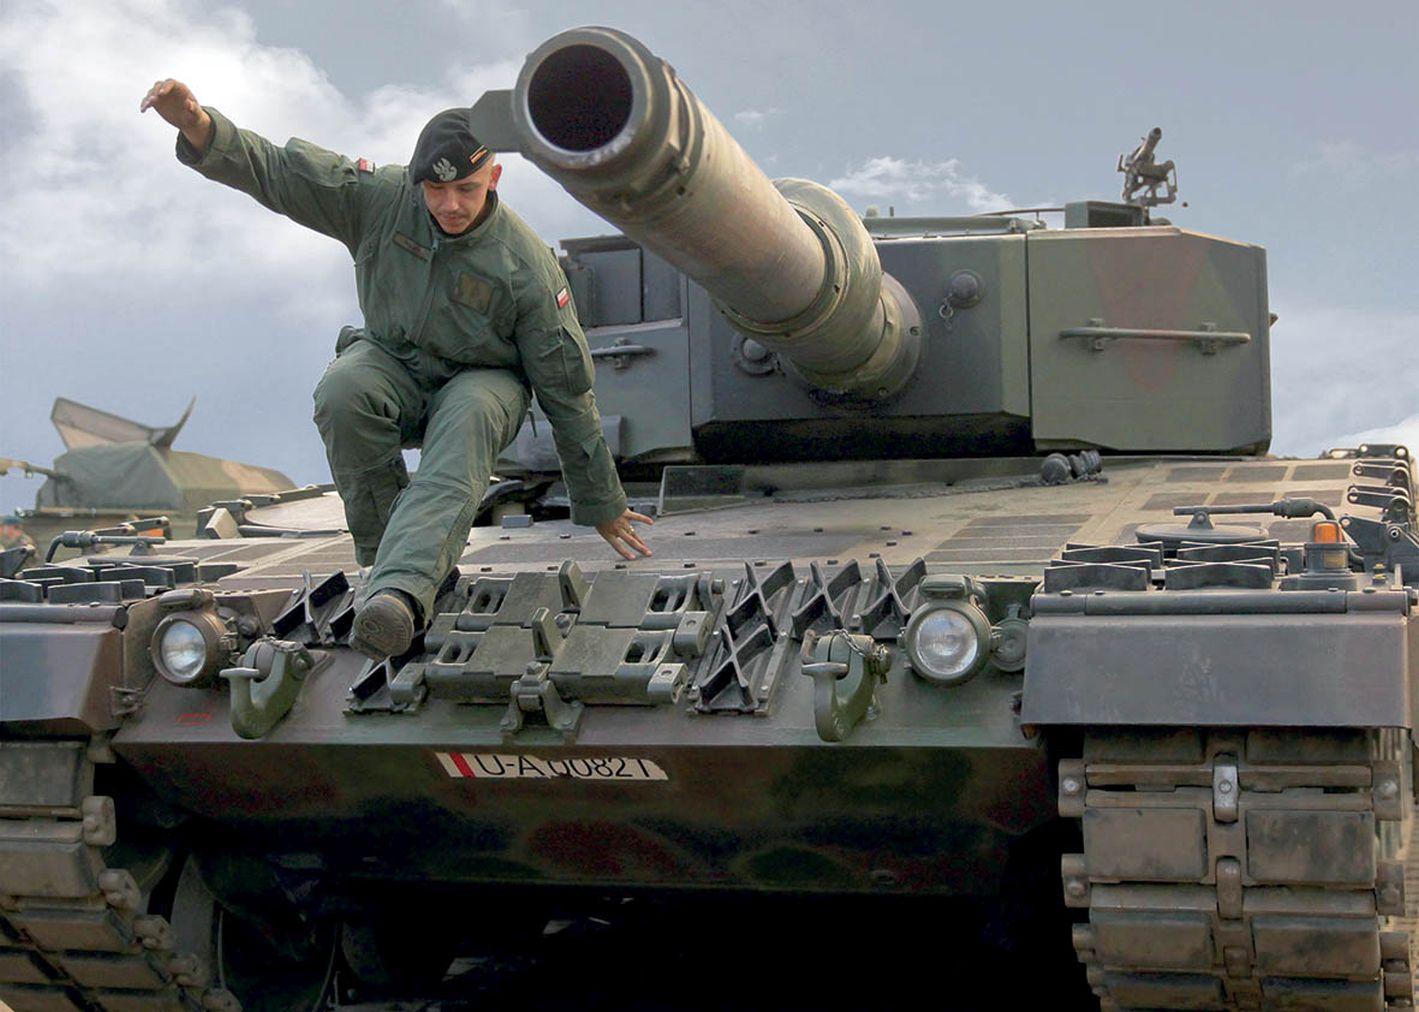 Military - Andropol S.A. - Polski Producent Tkanin